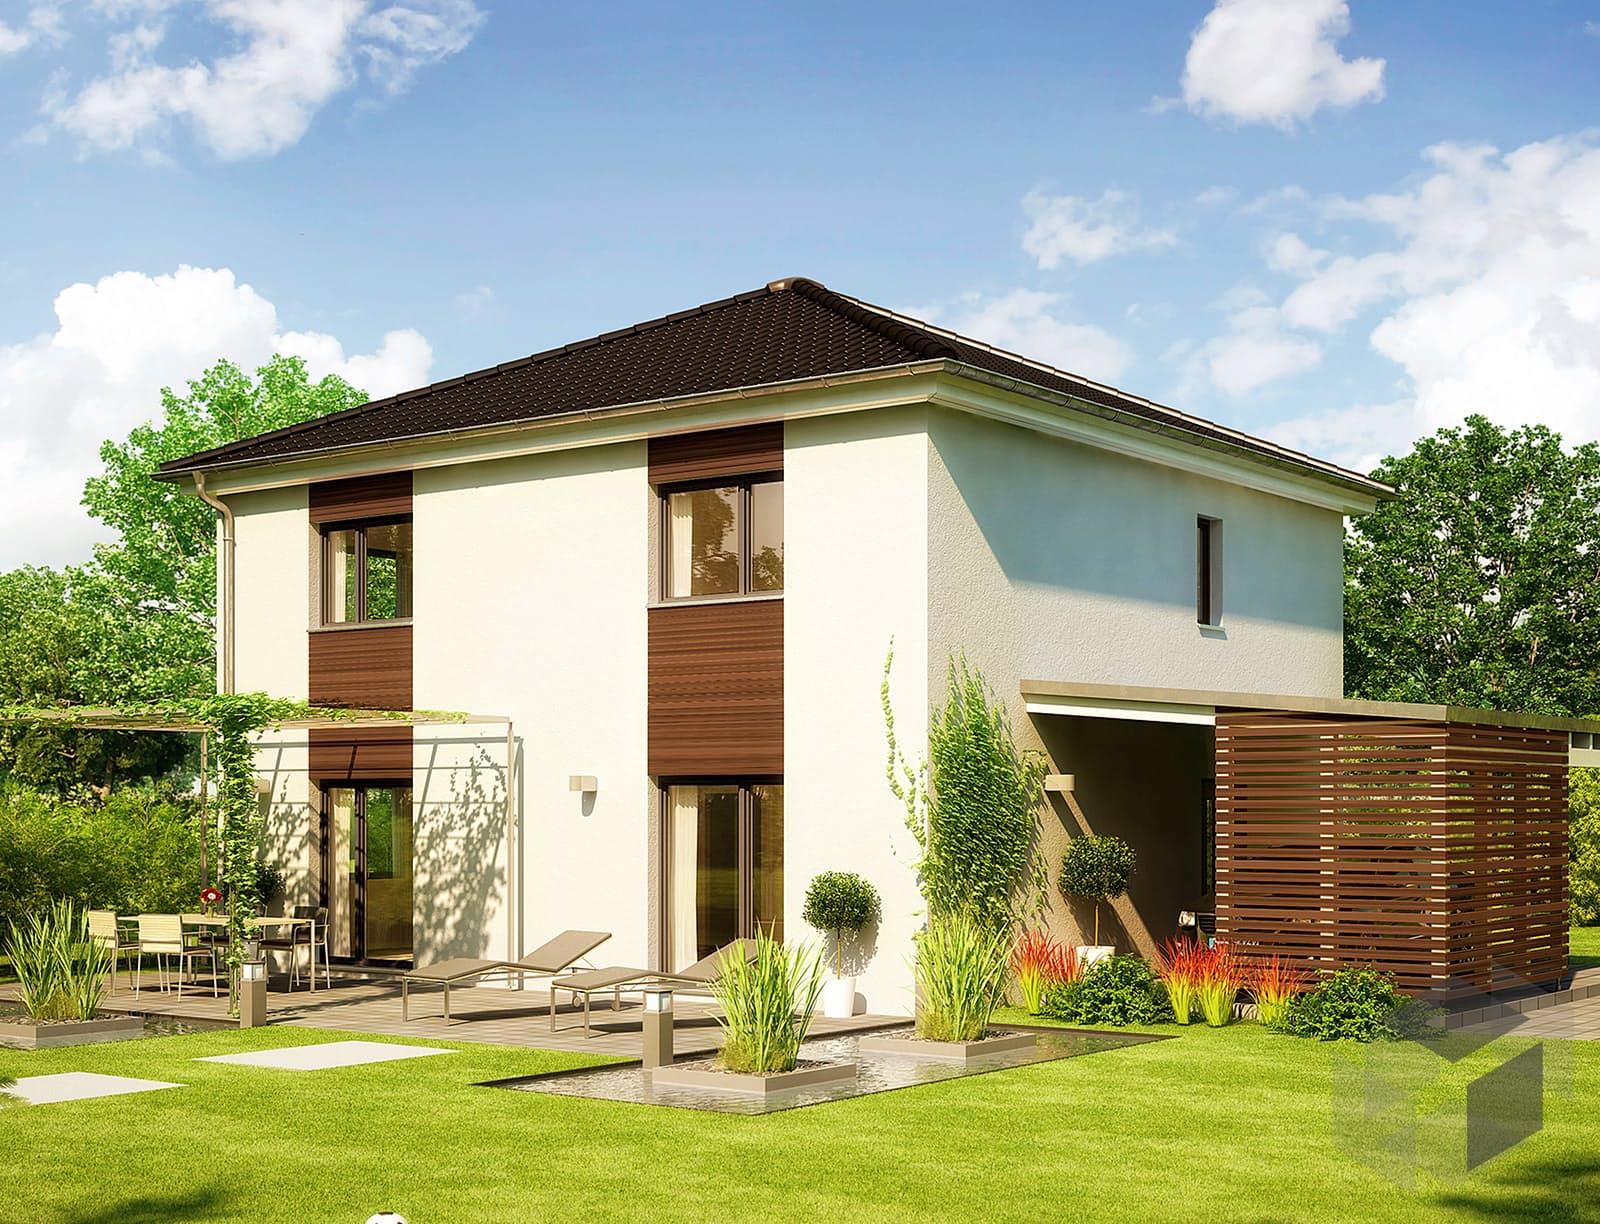 hanse haus preise schl sselfertig bungalow haus preise. Black Bedroom Furniture Sets. Home Design Ideas